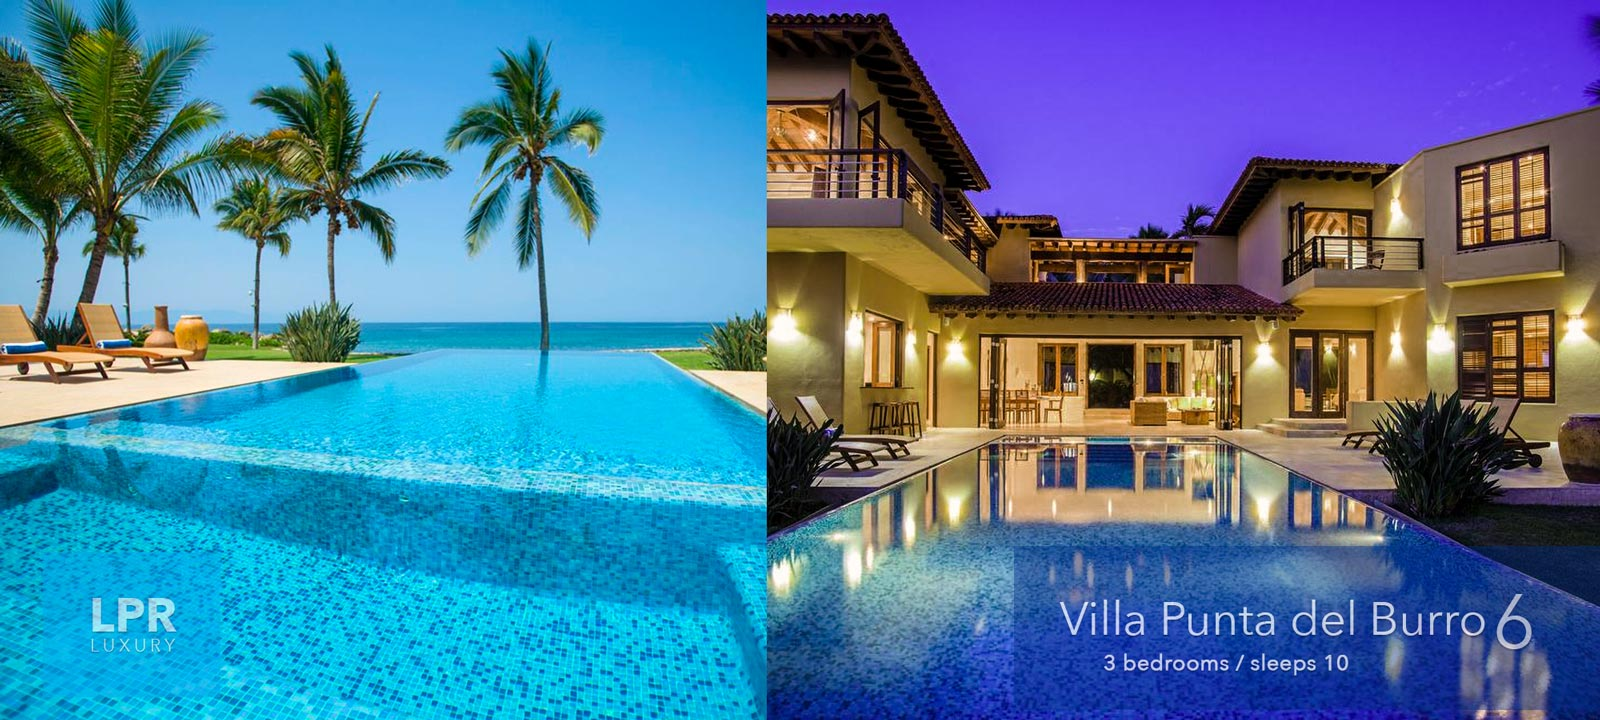 Villa Punta del Buro 6 - Beachfront vacation rental villa on Punta del Burro surf beach - Punta de Mita, North shore Puerto Vallarta, Riviera Nayarit, Mexico